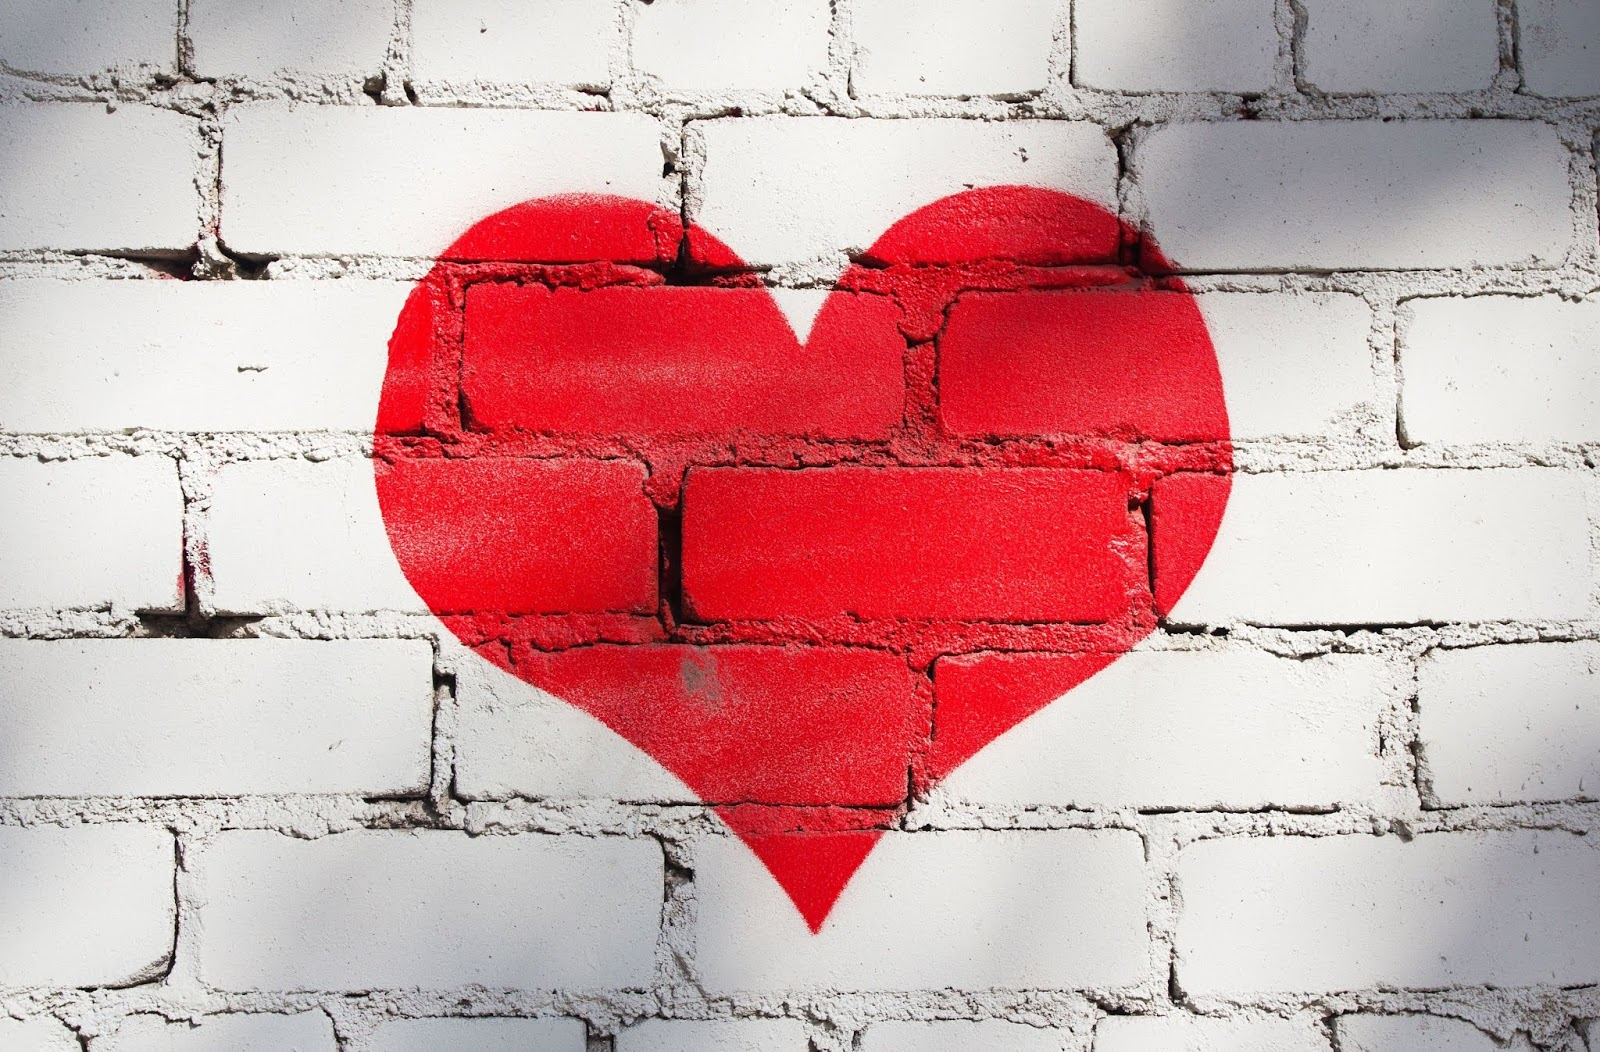 Beautiful Love Wallpaper For Mobile Phone Hd - Background Love Full Hd - HD Wallpaper